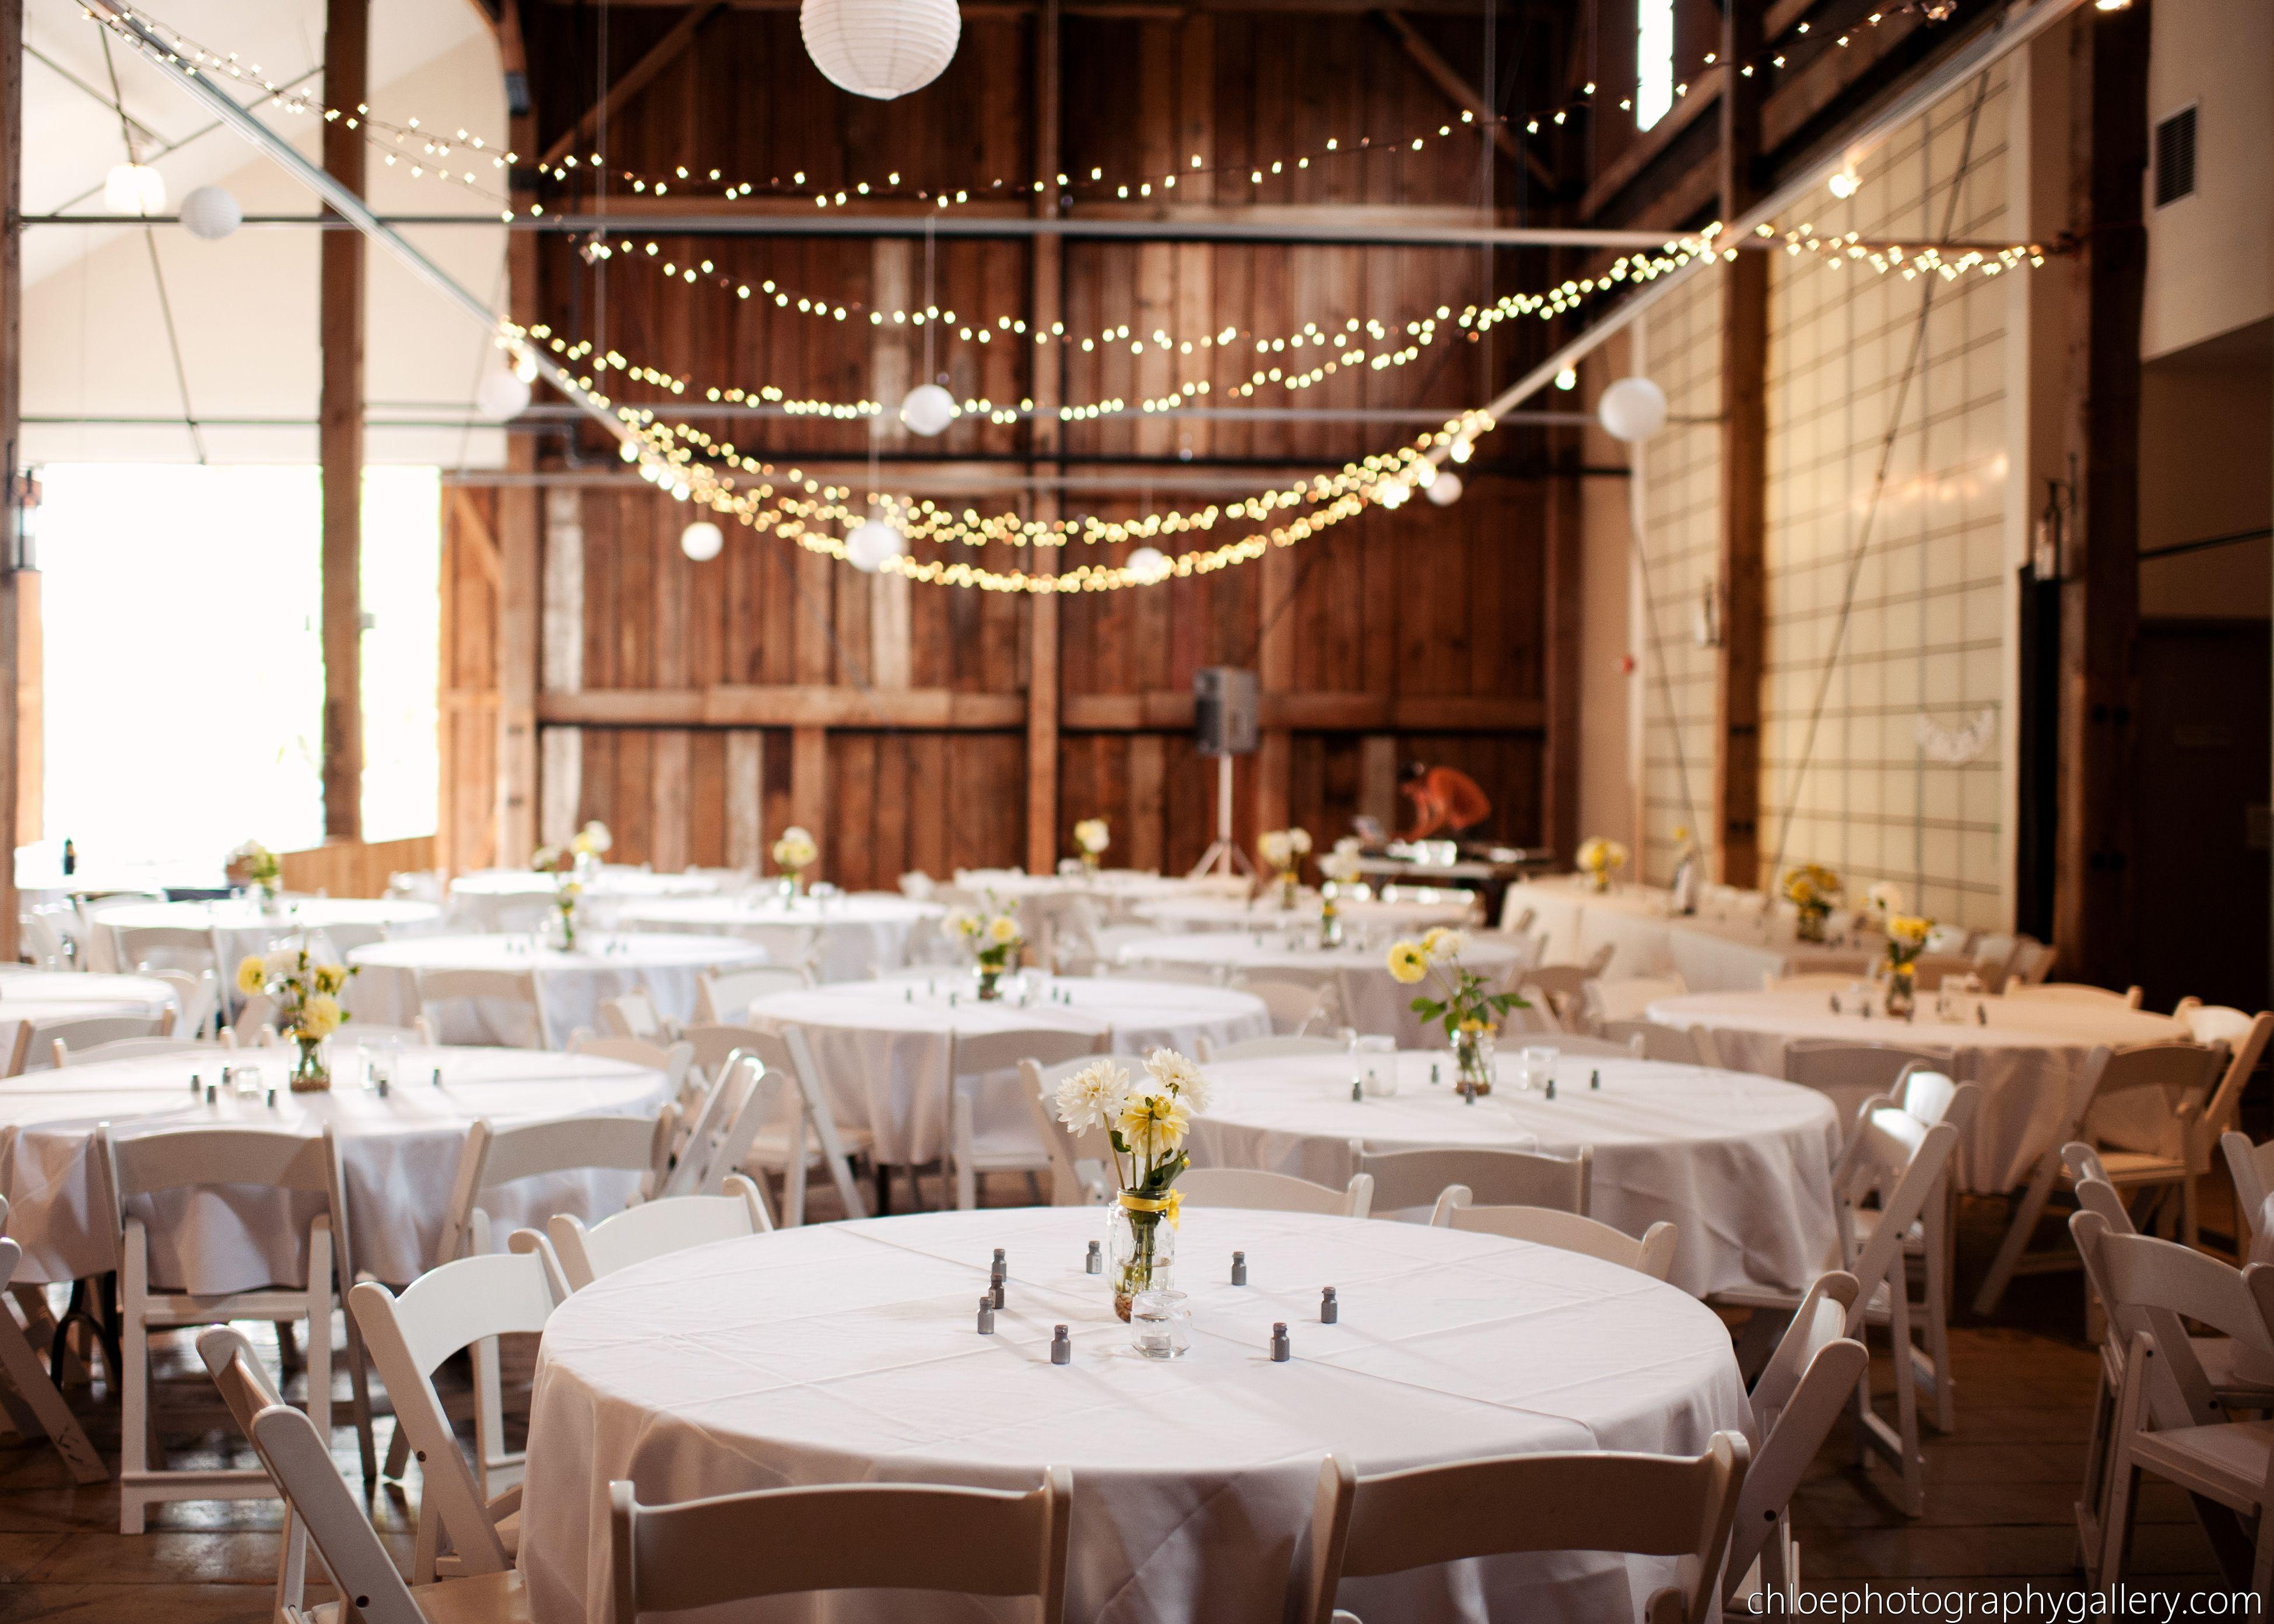 Pickering Barn Issaquah Wa Seattle Wedding Venues Winter Wedding Venues Event Venue Spaces